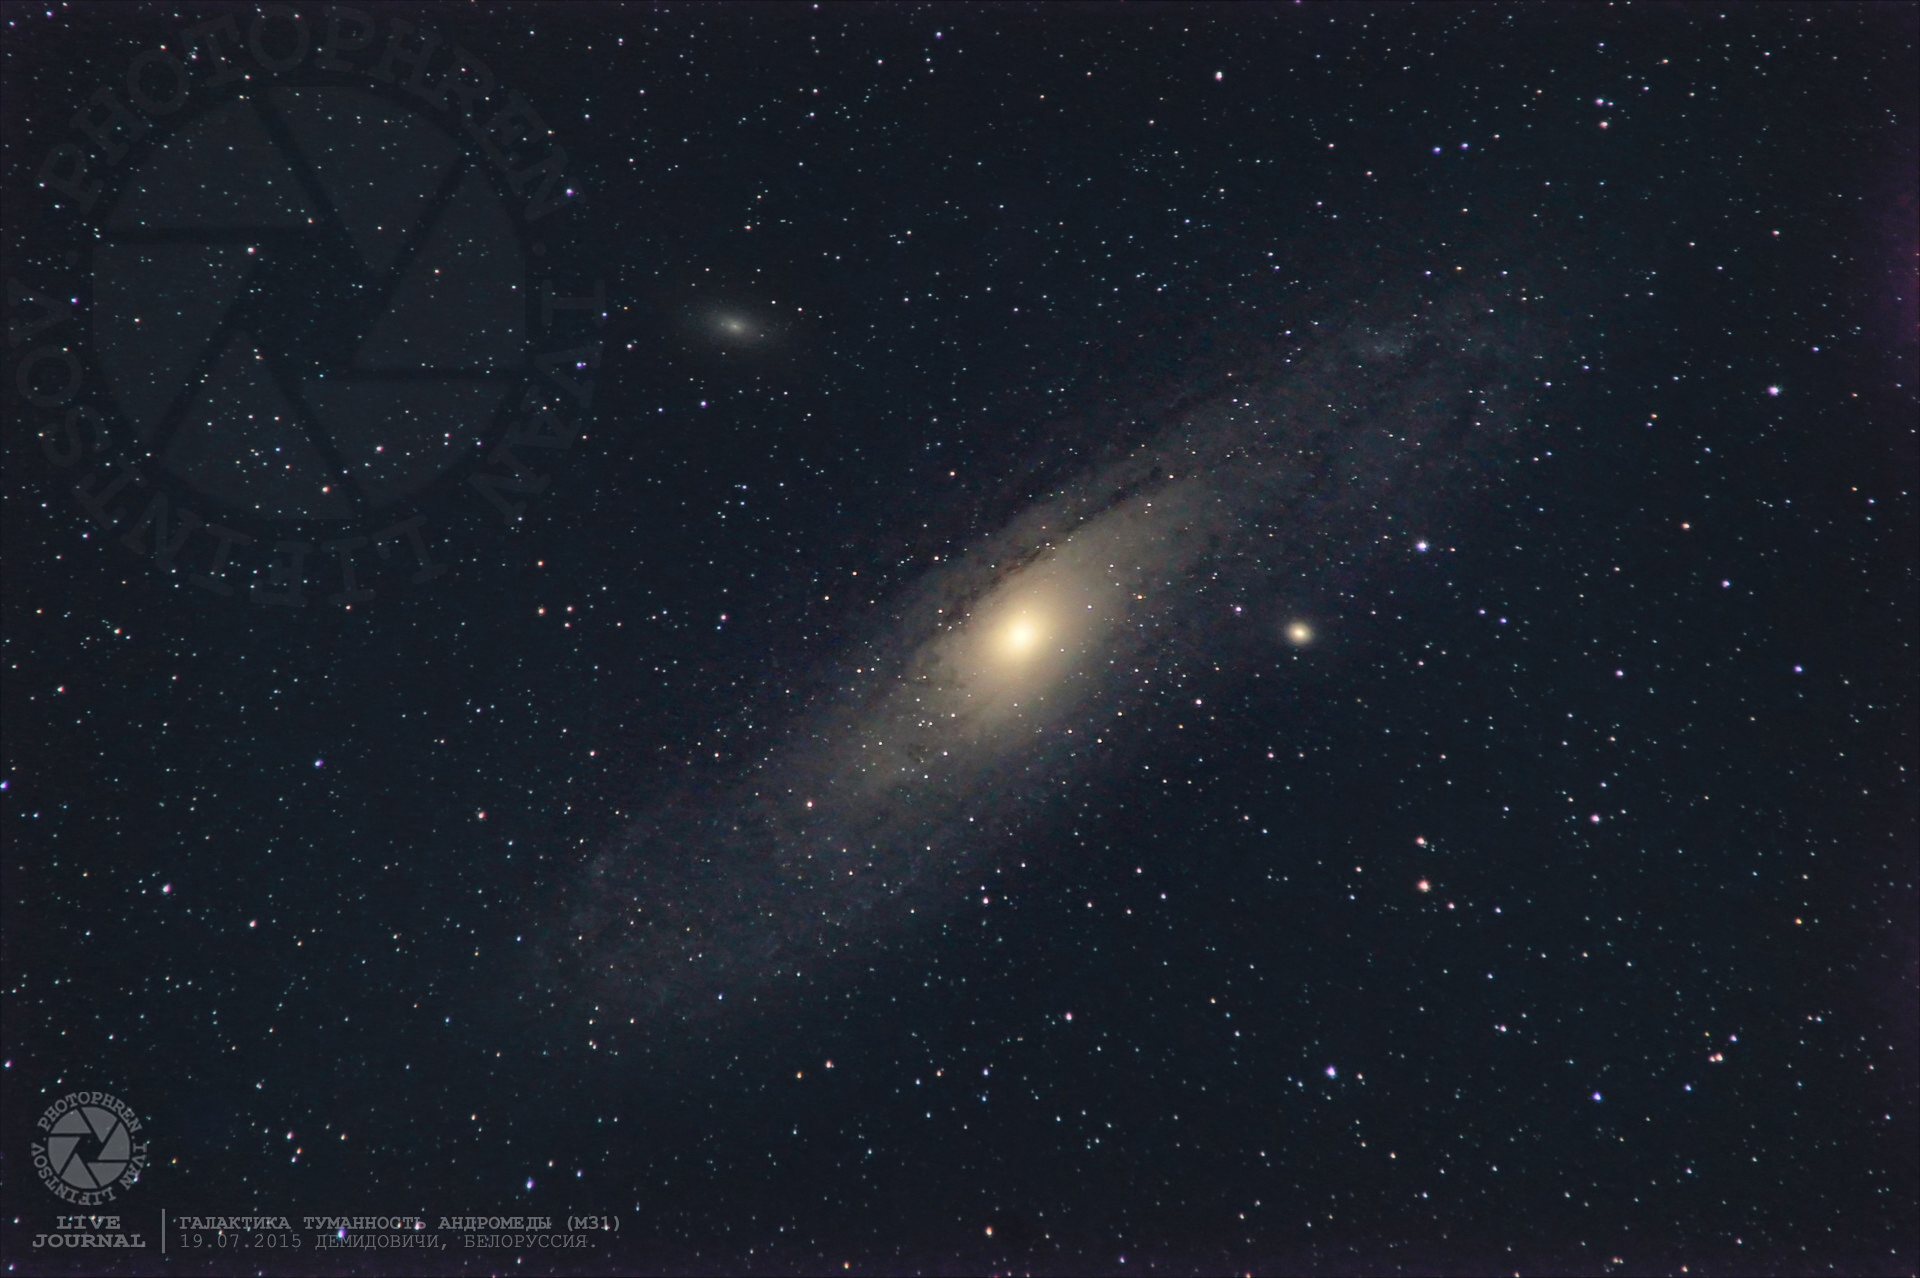 M31_1920_1.jpg